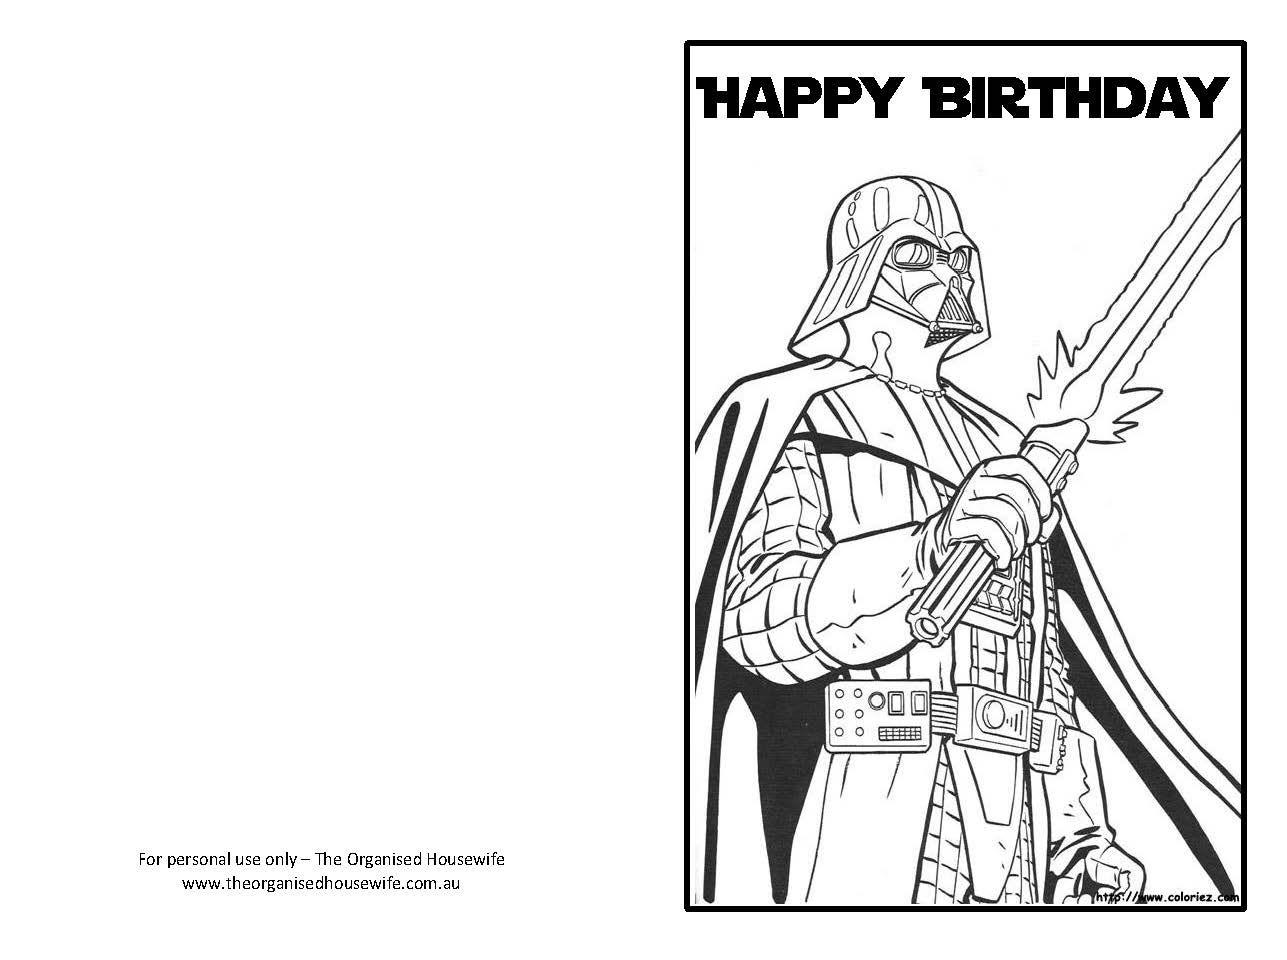 Home Holidays Birthday Cards Star Wars Birthday Card Star Wars – Free Birthday Cards to Print at Home